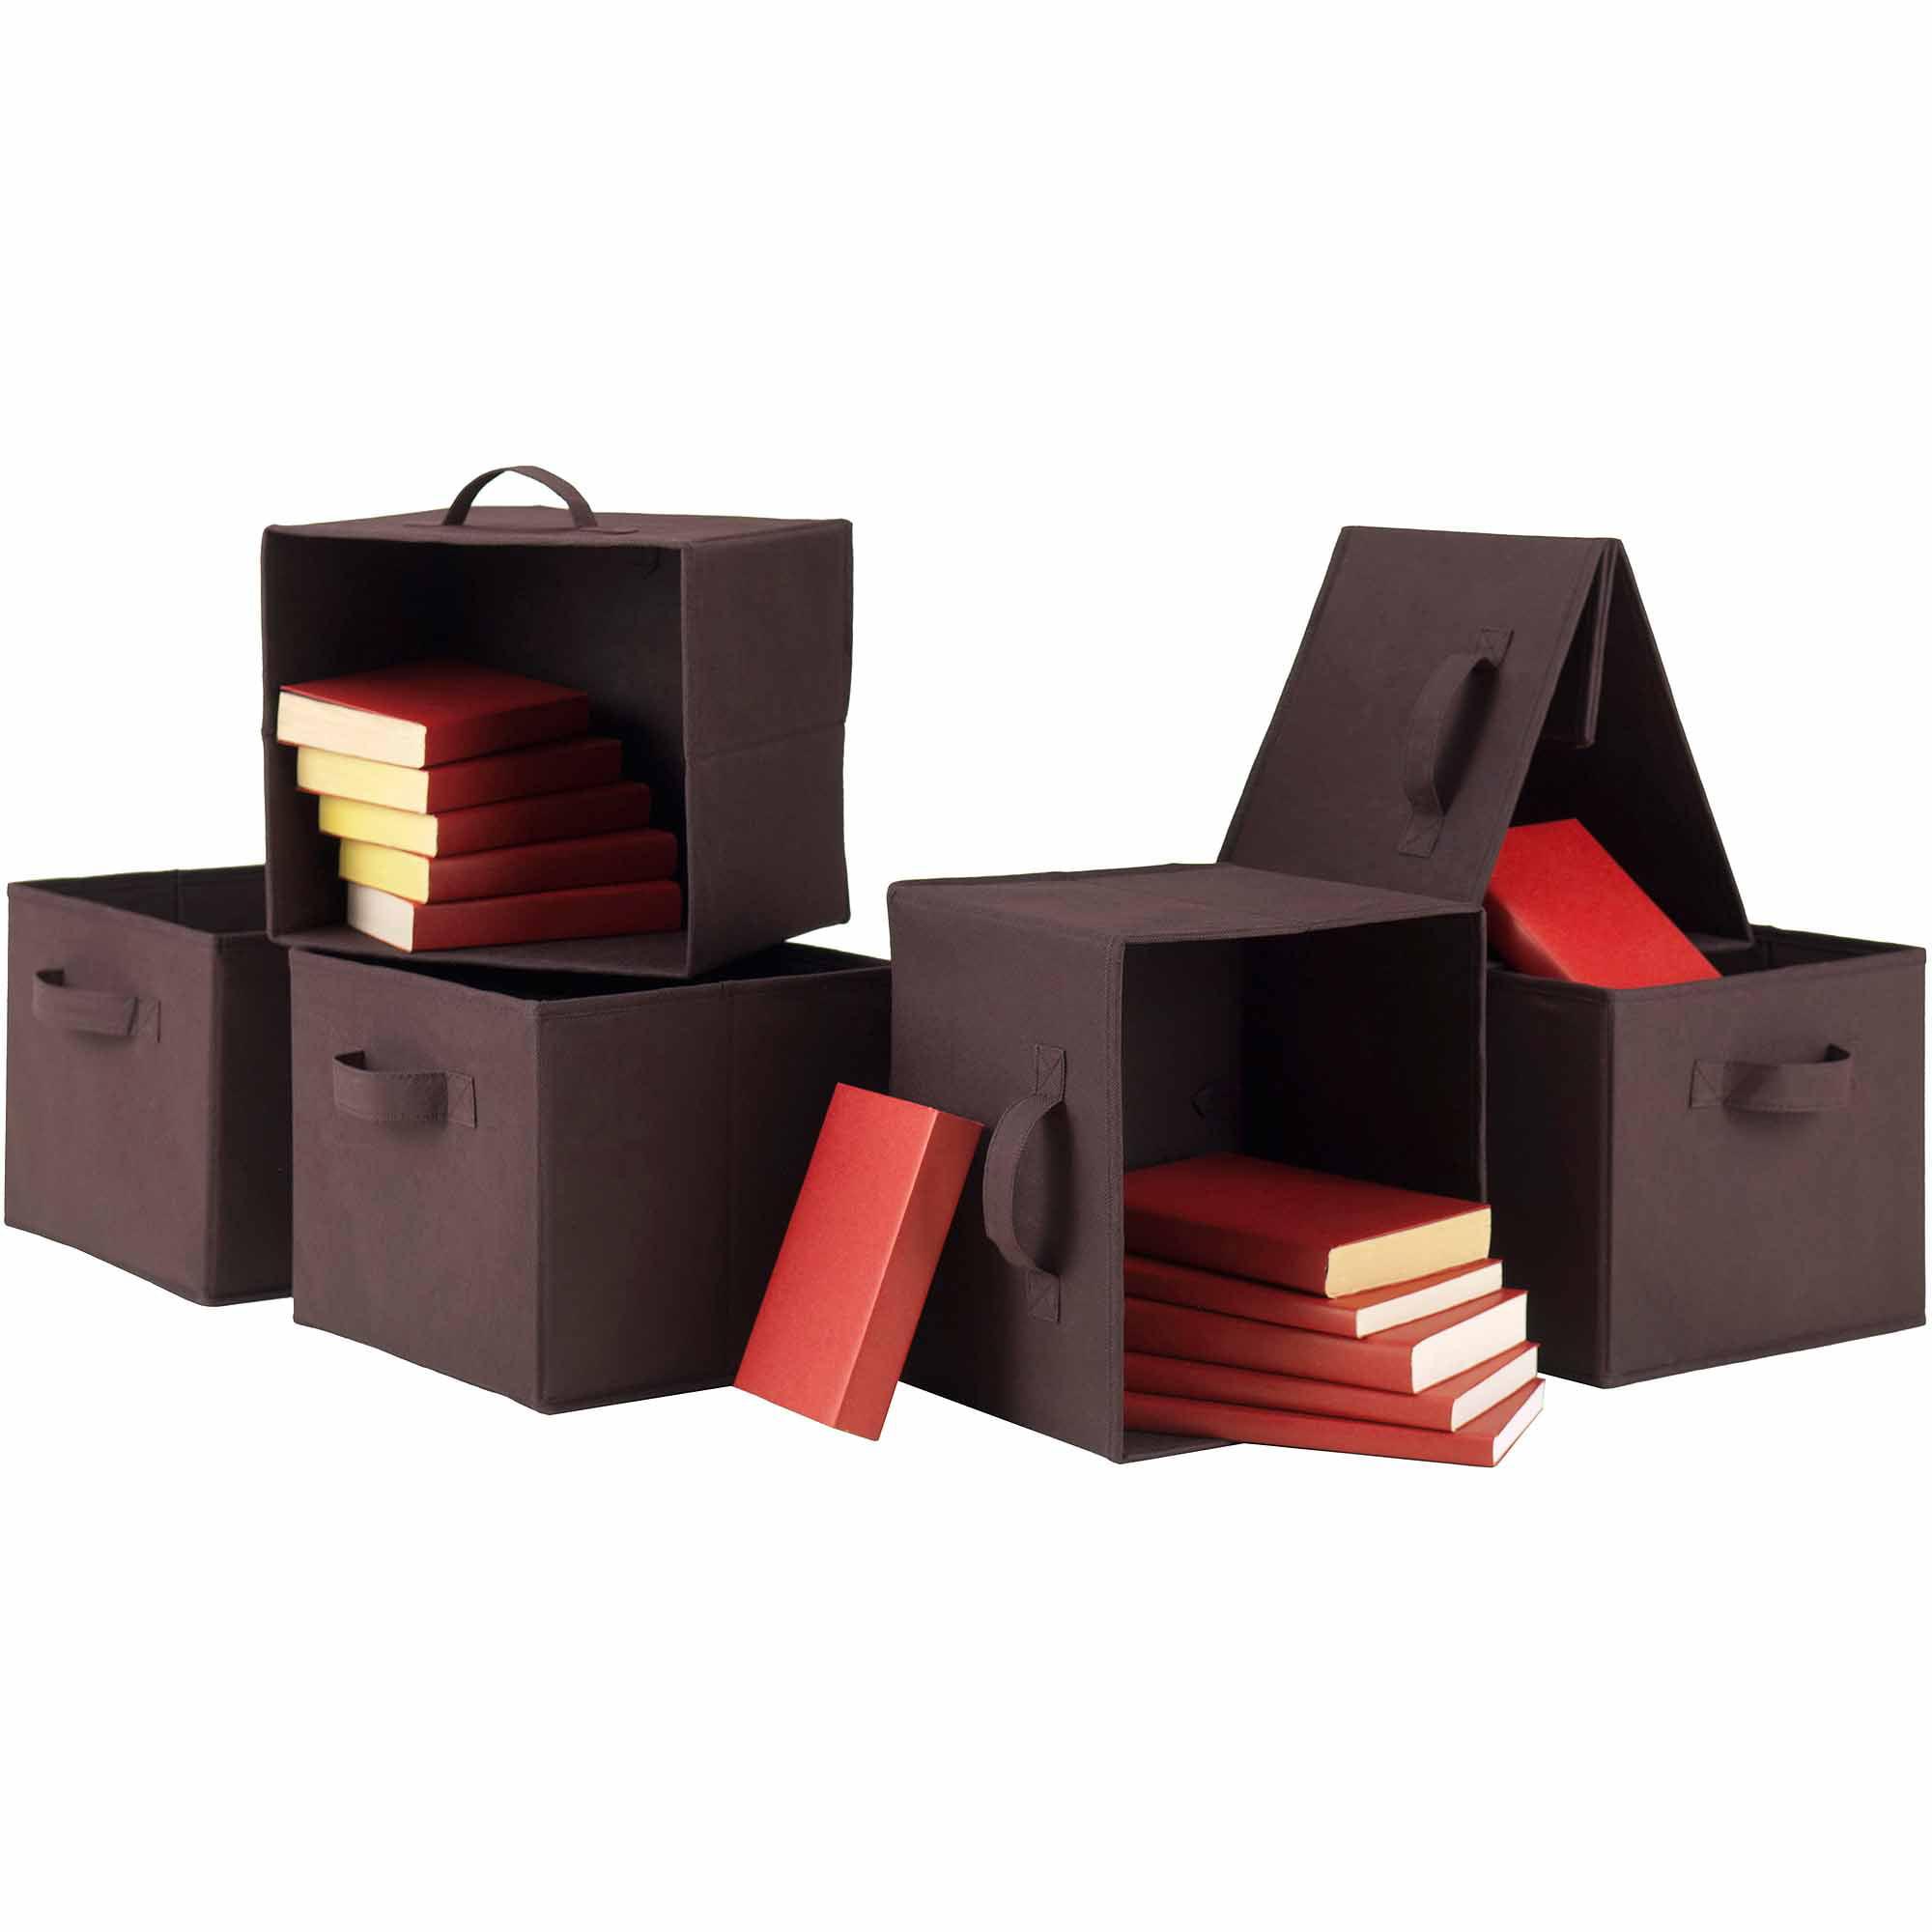 Foldable Fabric Baskets, Chocolate, Set of 6